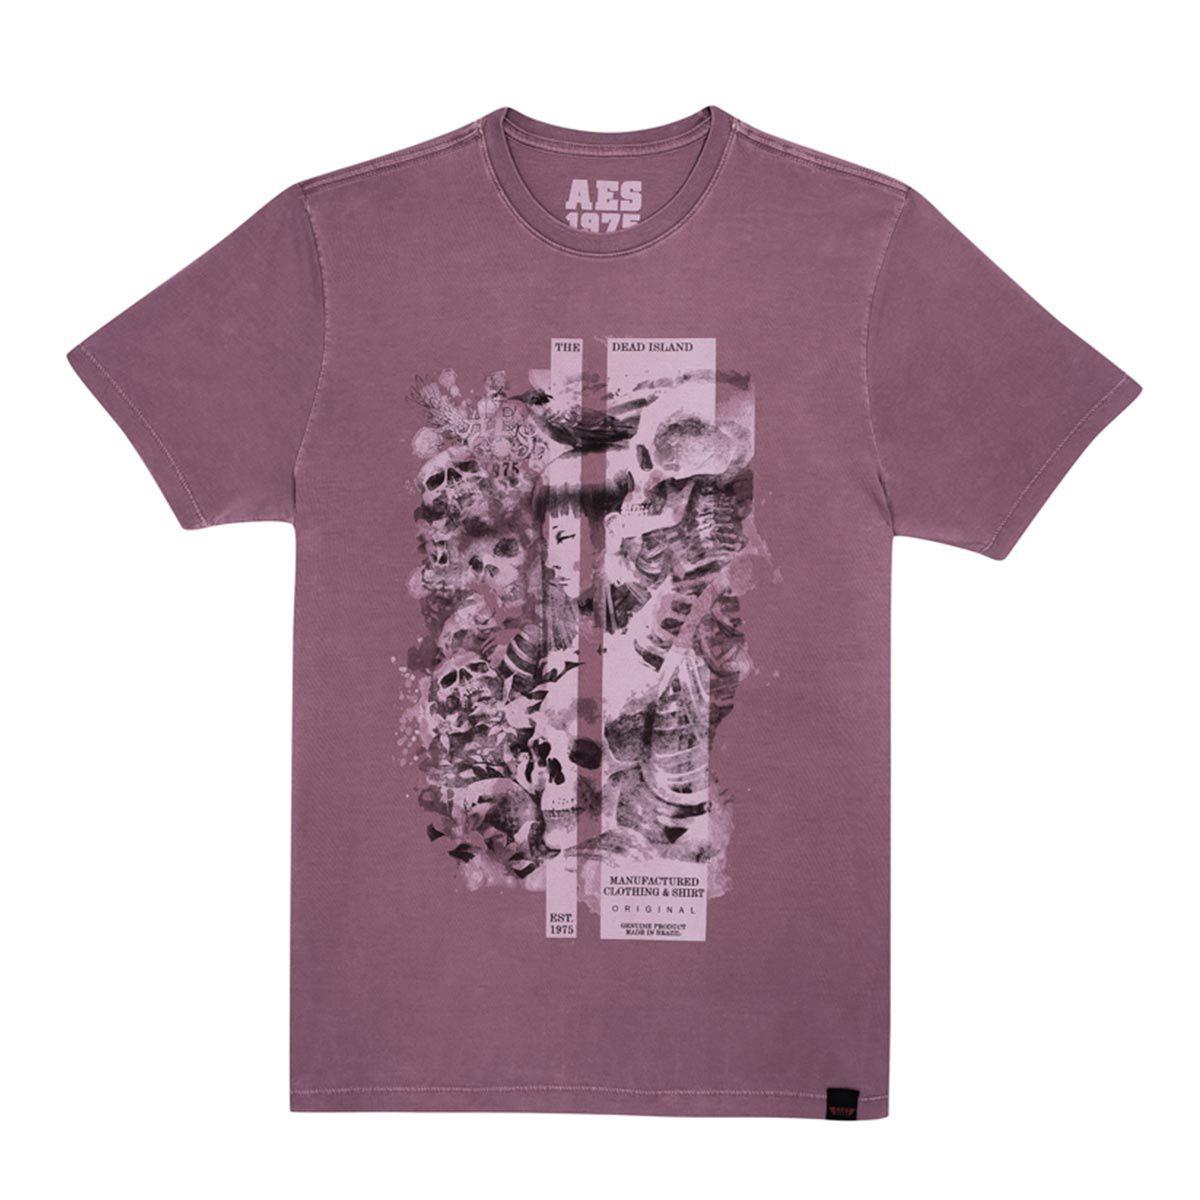 Camiseta AES 1975 The Island